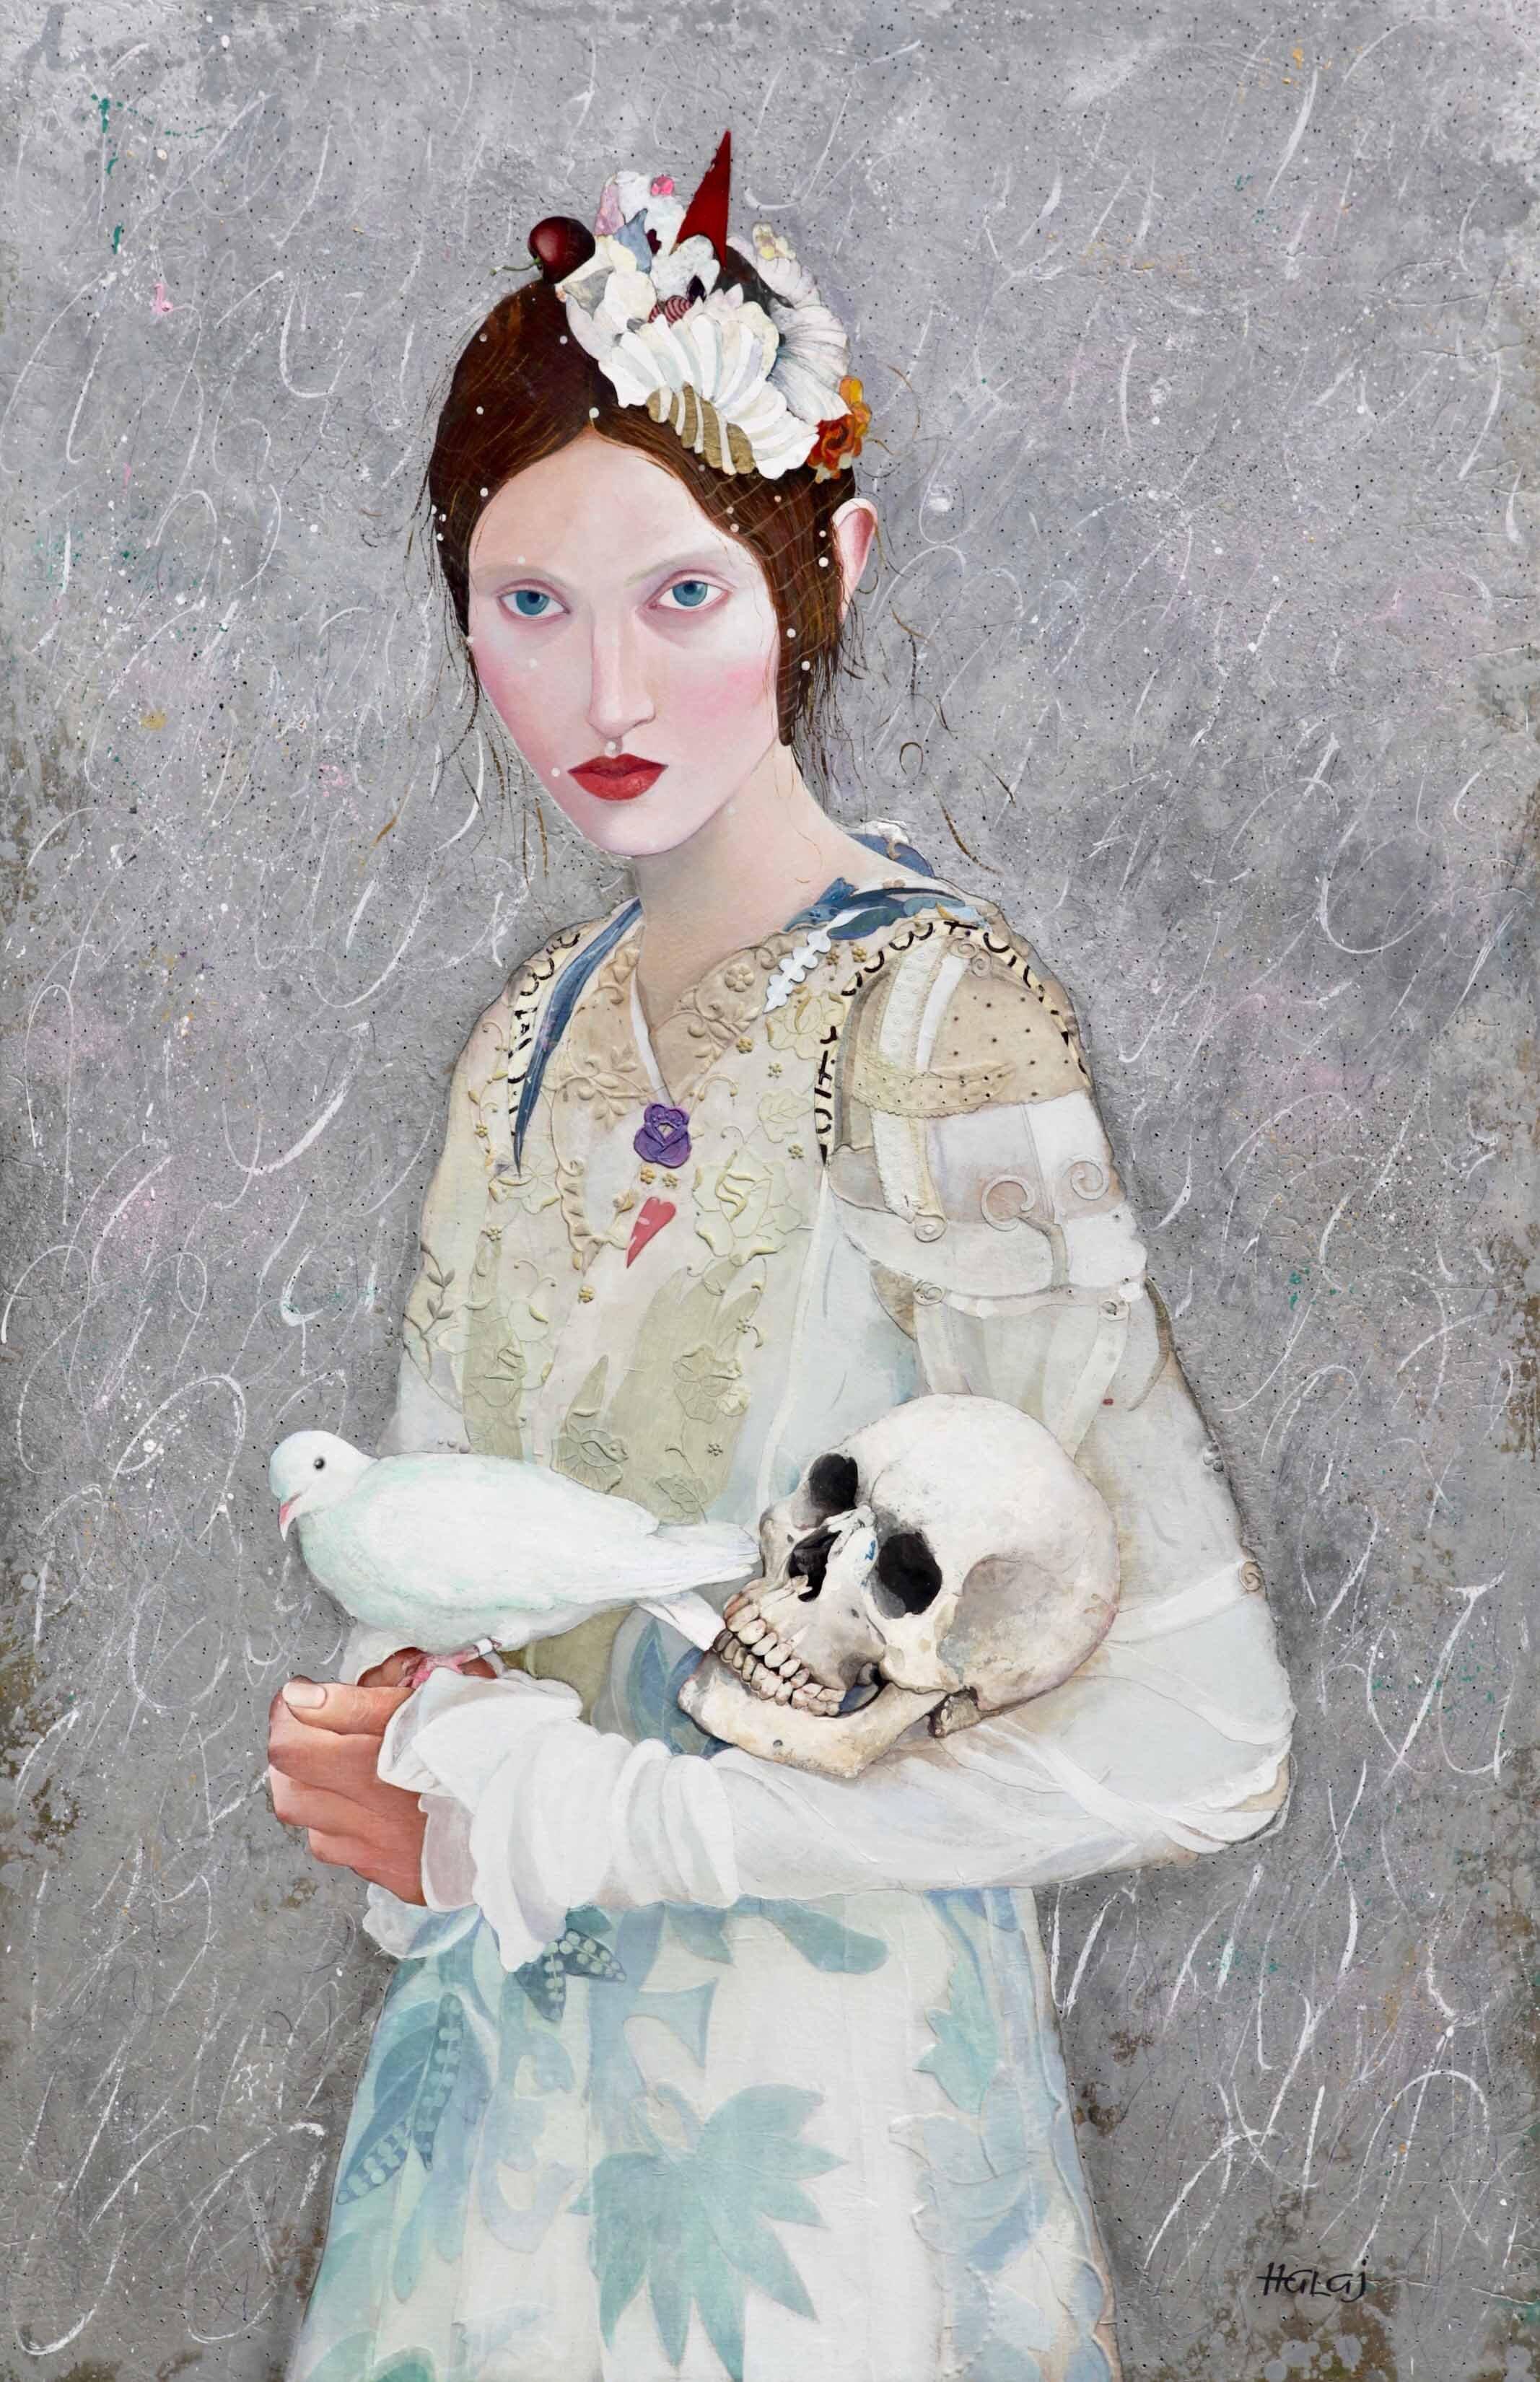 Minas Halaj %22 Girl With A Bird %22 2019, Oil, wax, textile, mixed media on panel, 58x38 in. (147.32x96.52 cm.).jpg